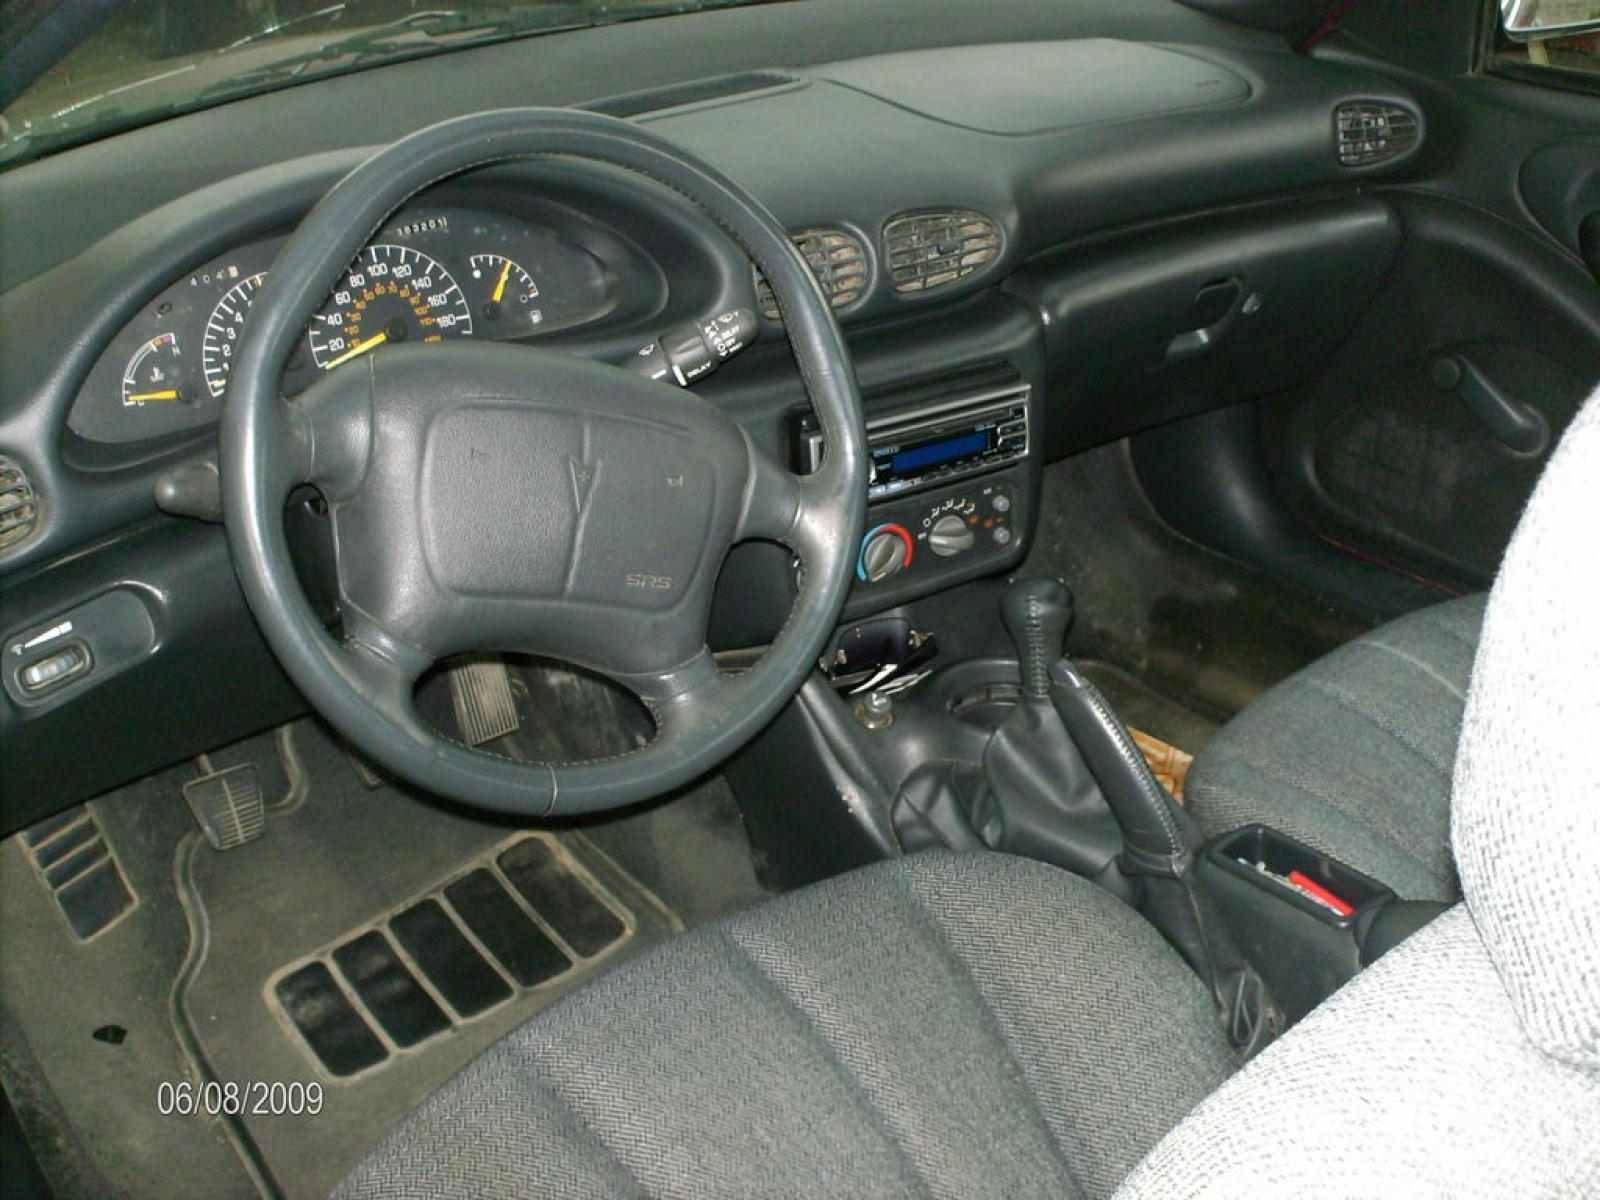 1996 pontiac sunfire information and photos zombiedrive rh zombdrive com 1998 Pontiac Sunfire 1996 pontiac sunfire gt manual transmission